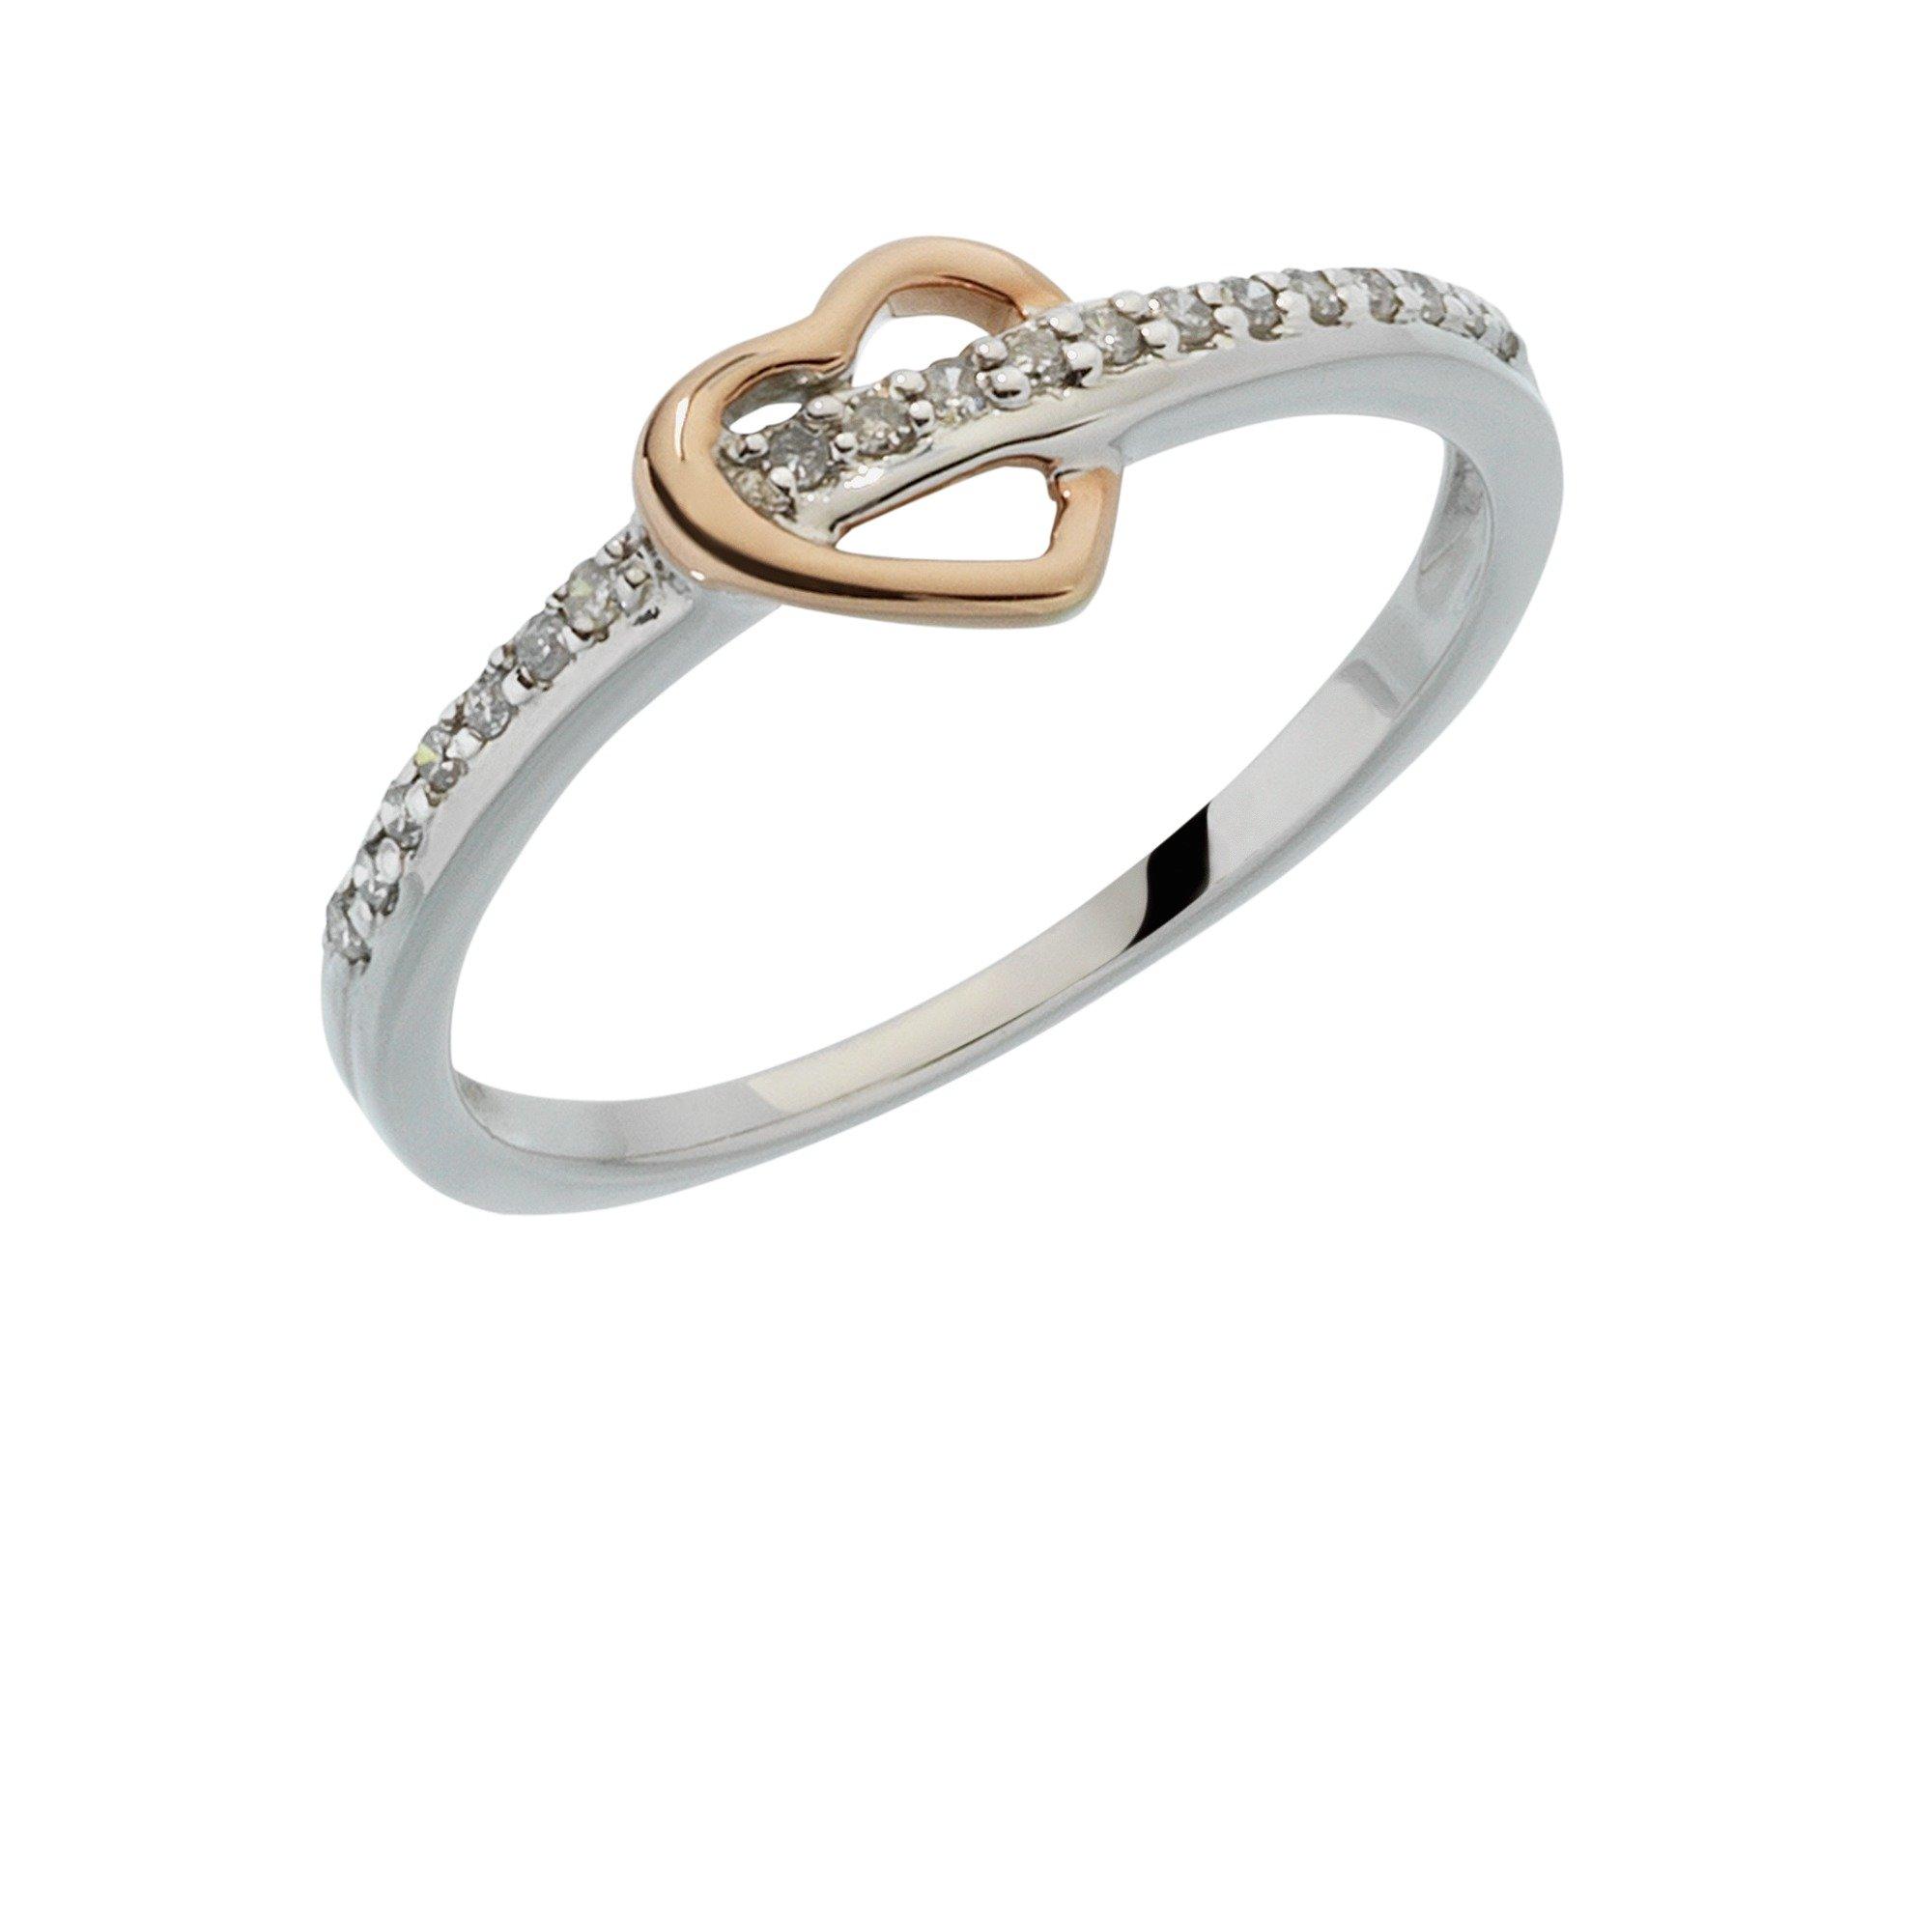 Buy 9ct White Gold 0 10ct tw Diamond Rose Gold Heart Ring at Argos